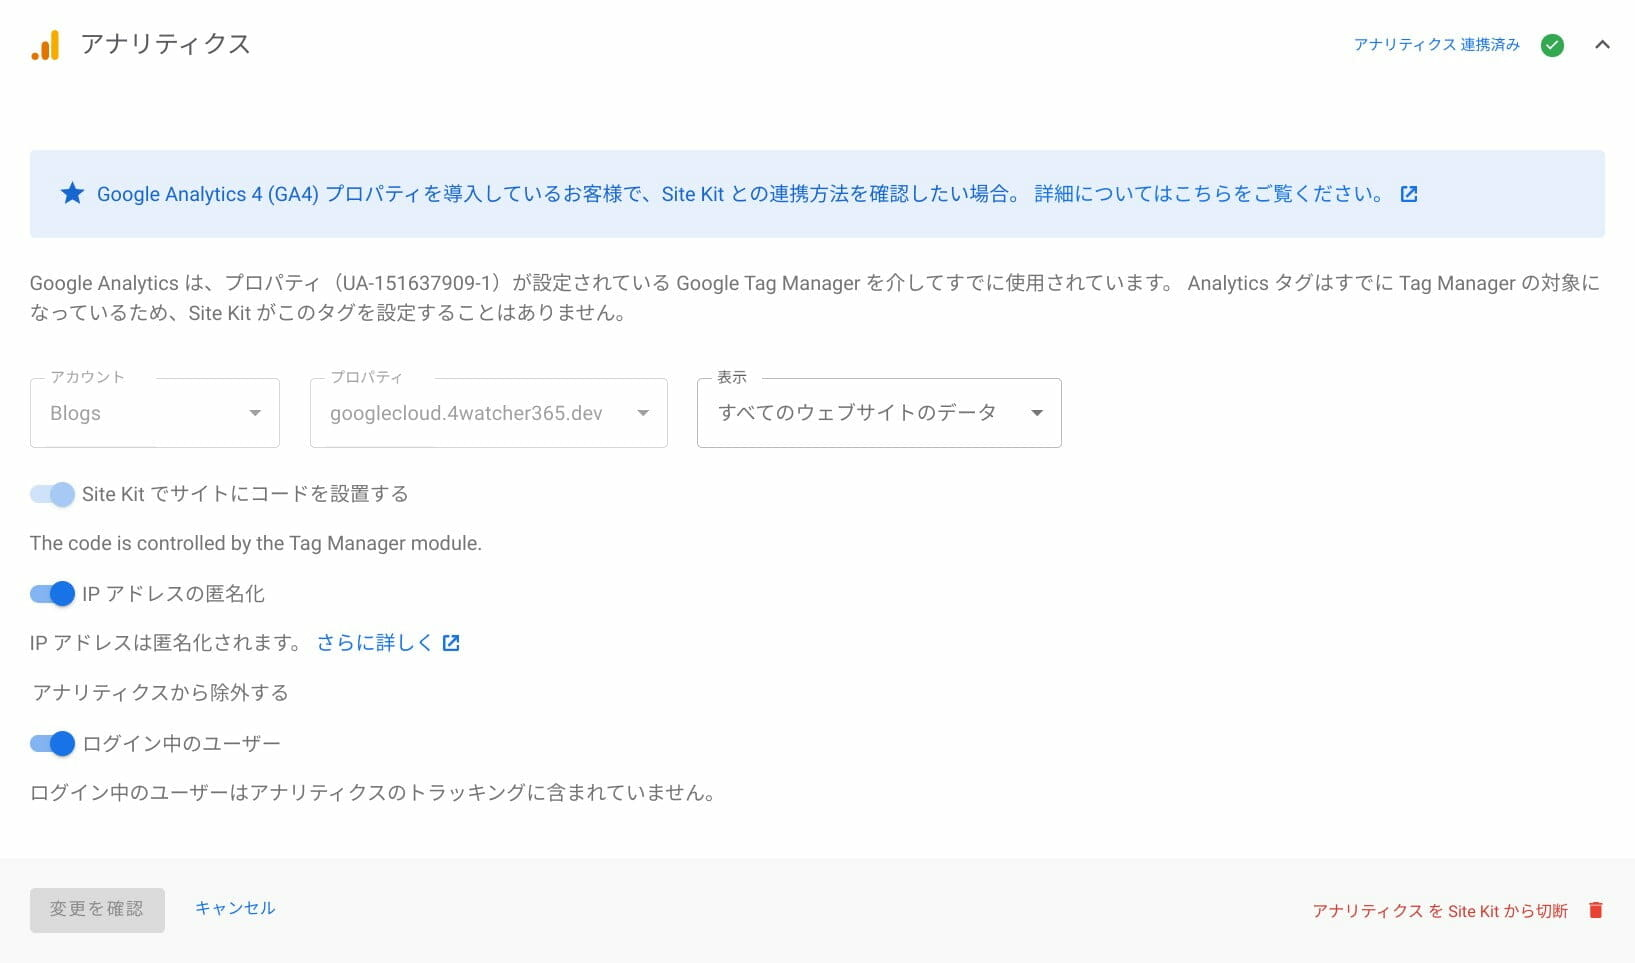 Site Kit:Google アナリティクスをデータ取得の設定